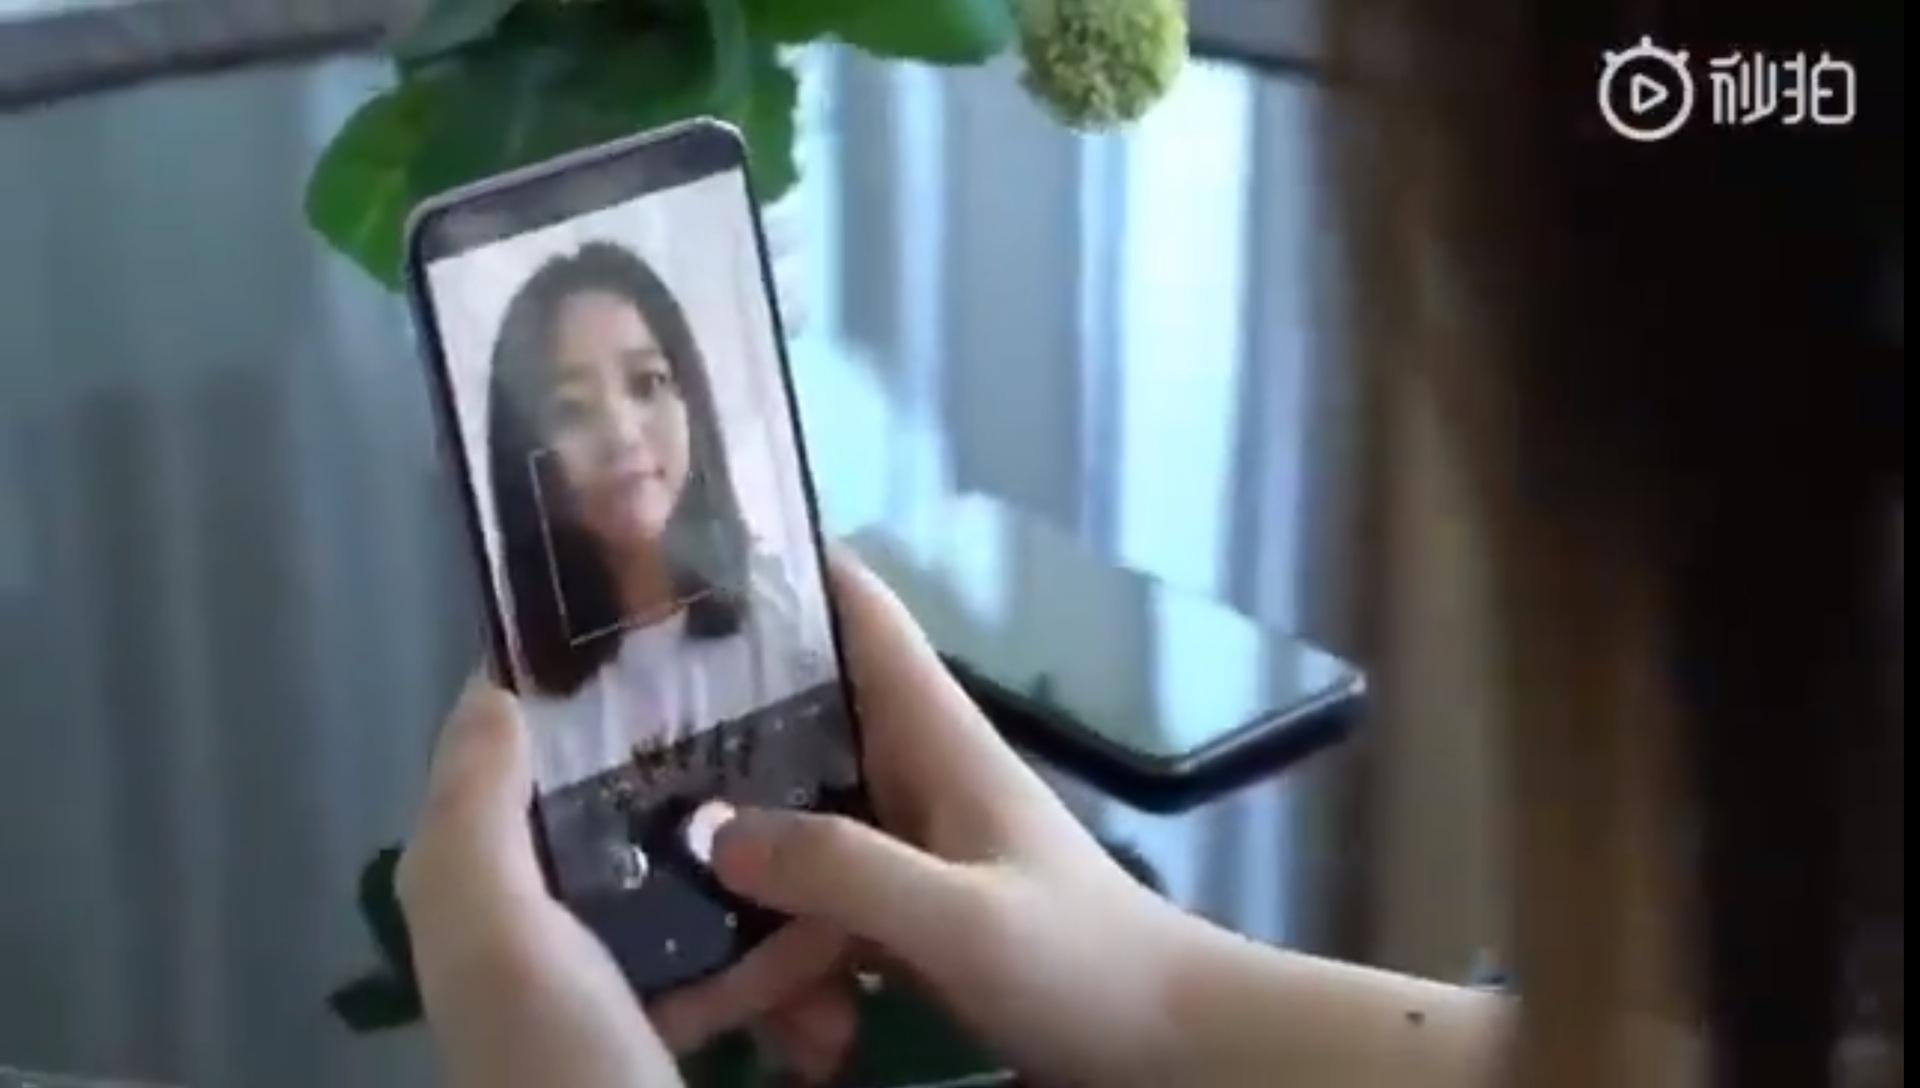 Xiaomi Mi 9 with under screen camera taking a selfie.